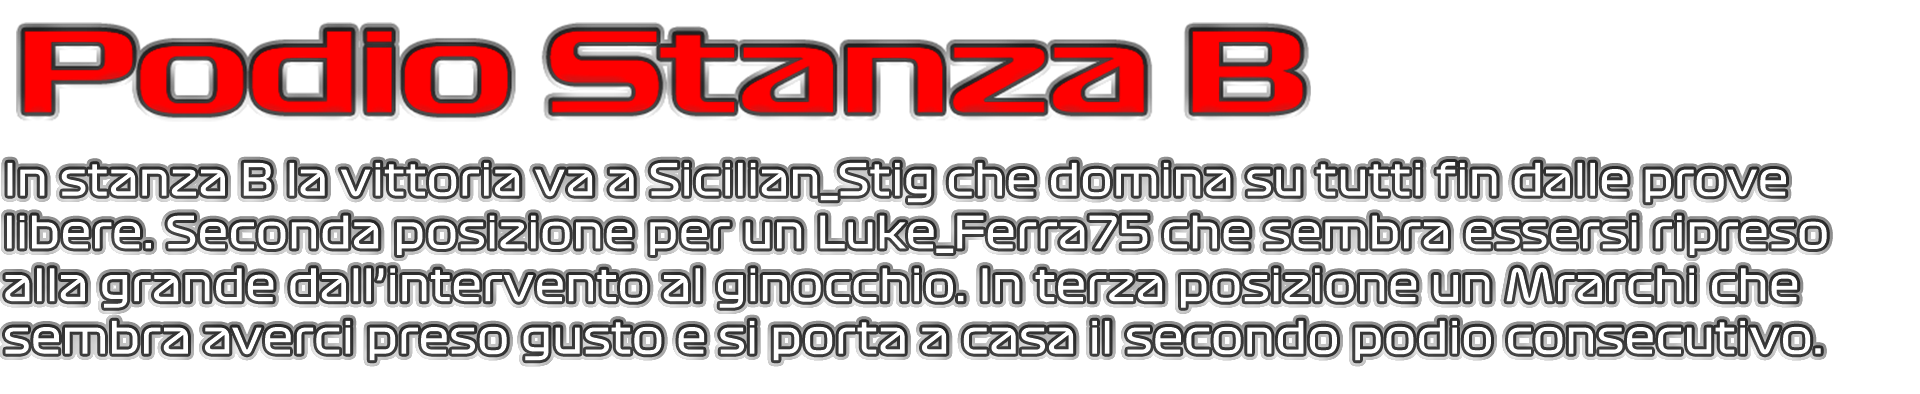 Garetta stasera random GT6-podio-stanza-png